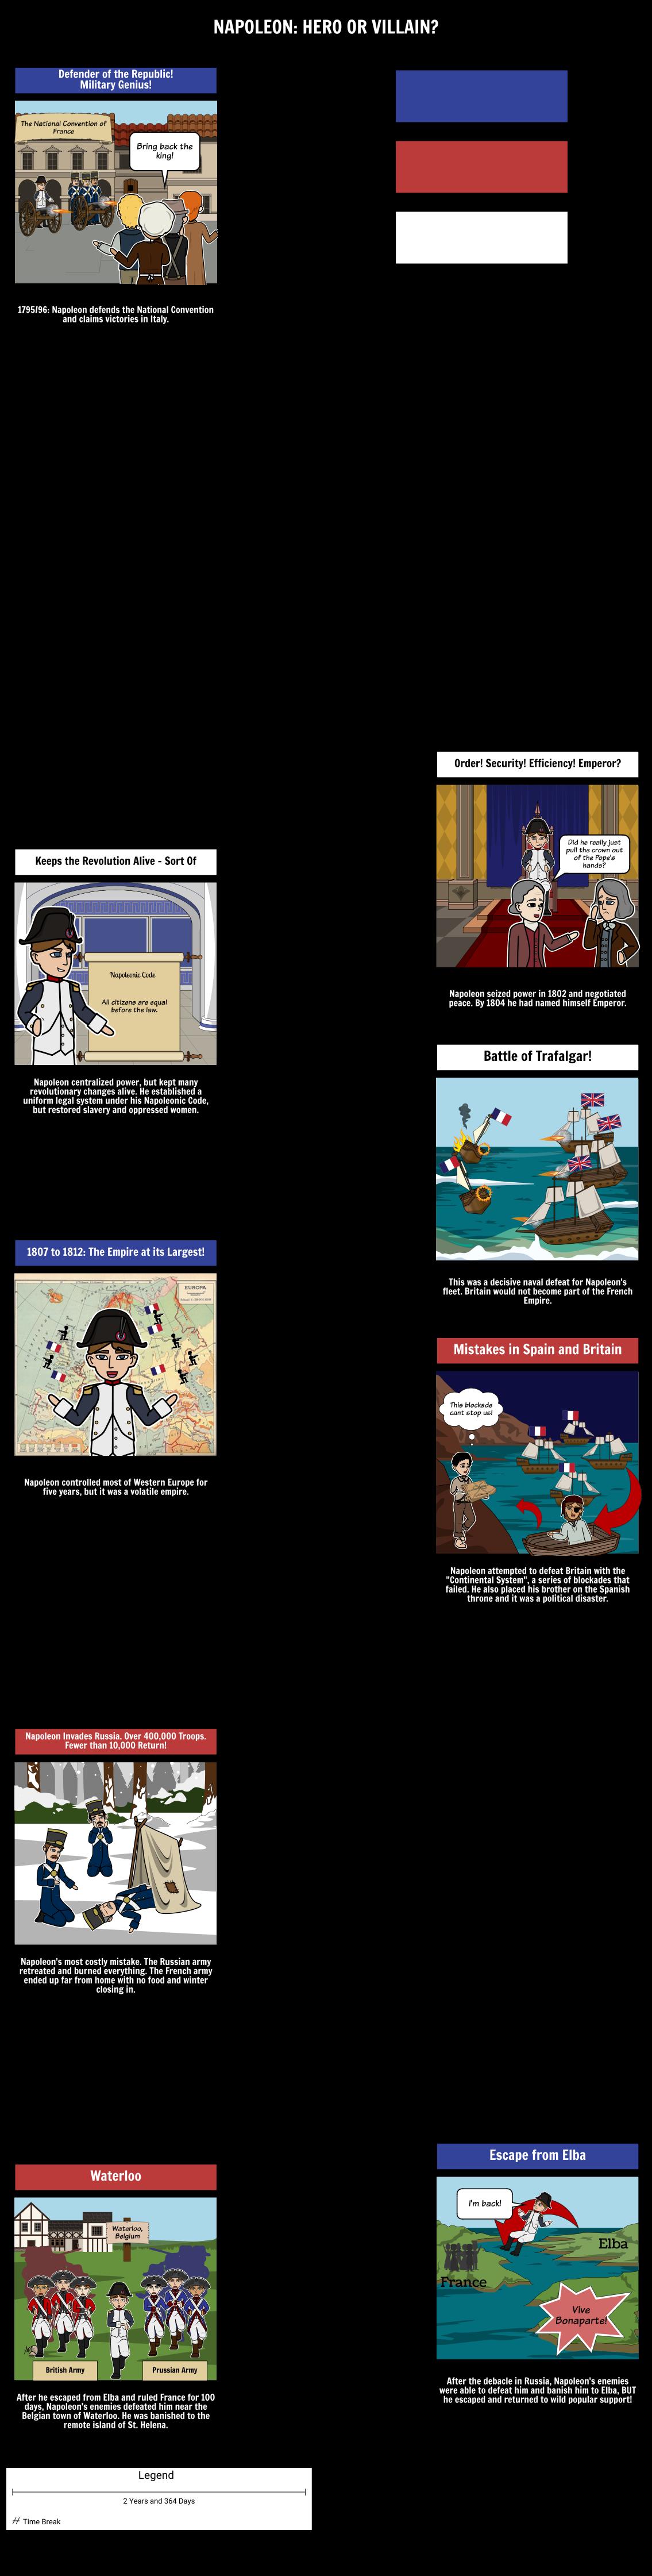 The French Revolution - Napoleon: Hero or Villain?